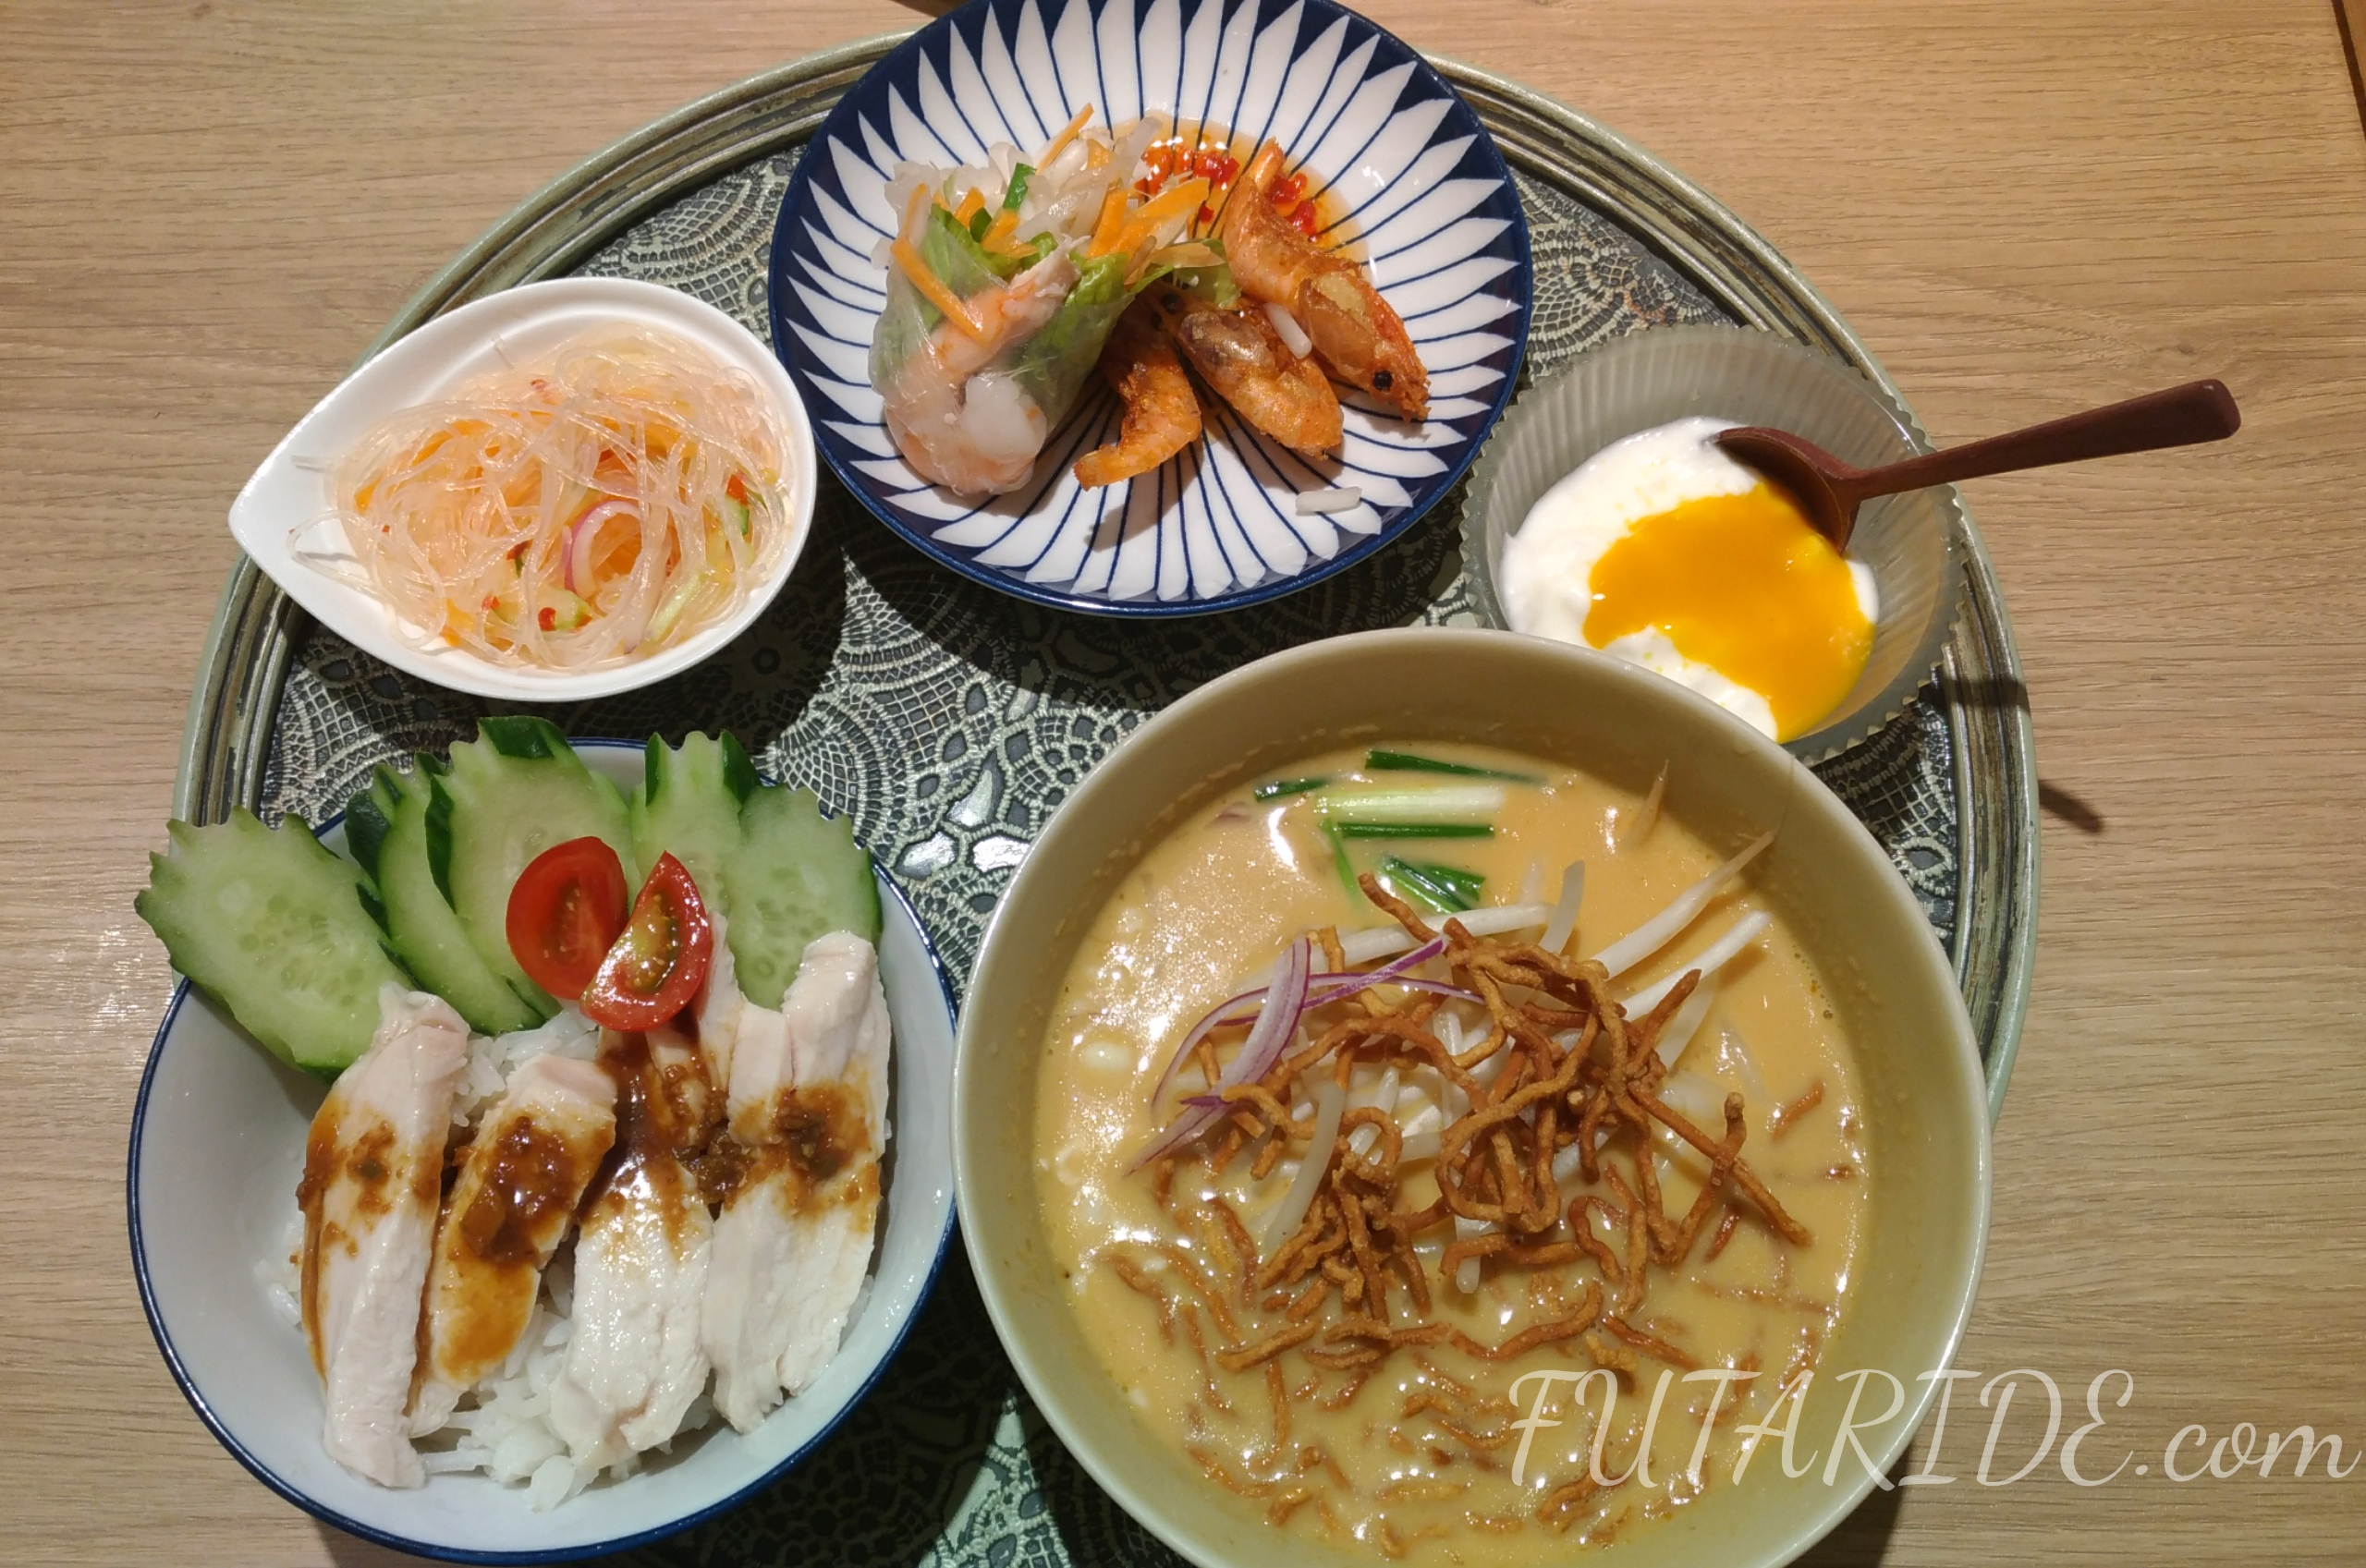 Rice people nice people エスニック料理 タイ料理